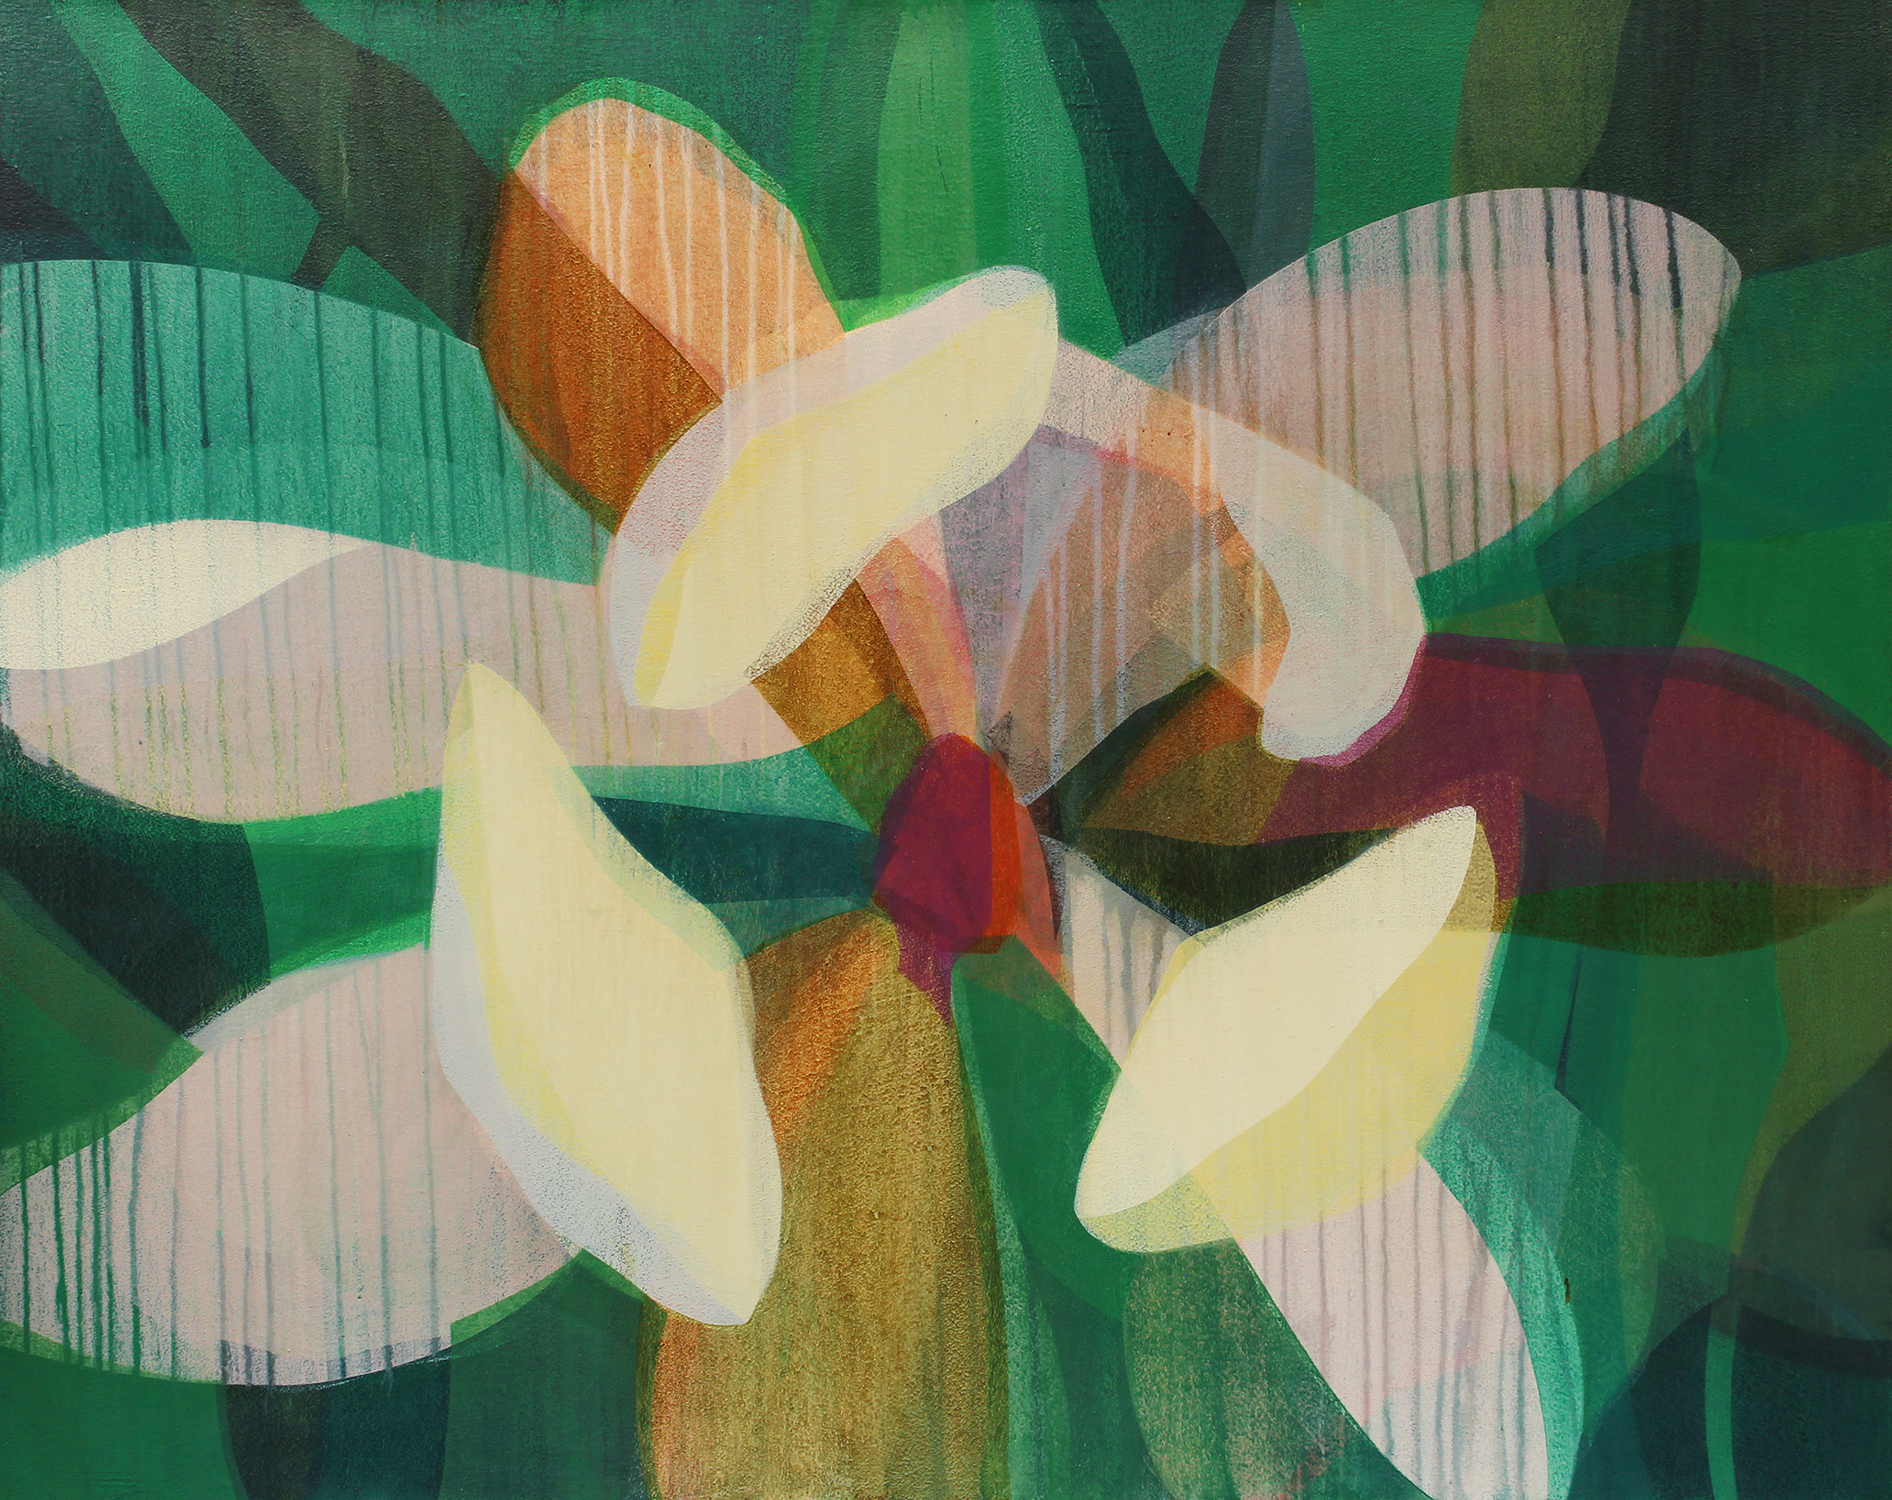 SANDOZ, Katherine - Magnolia - Magenta Orange - 48x60.jpg